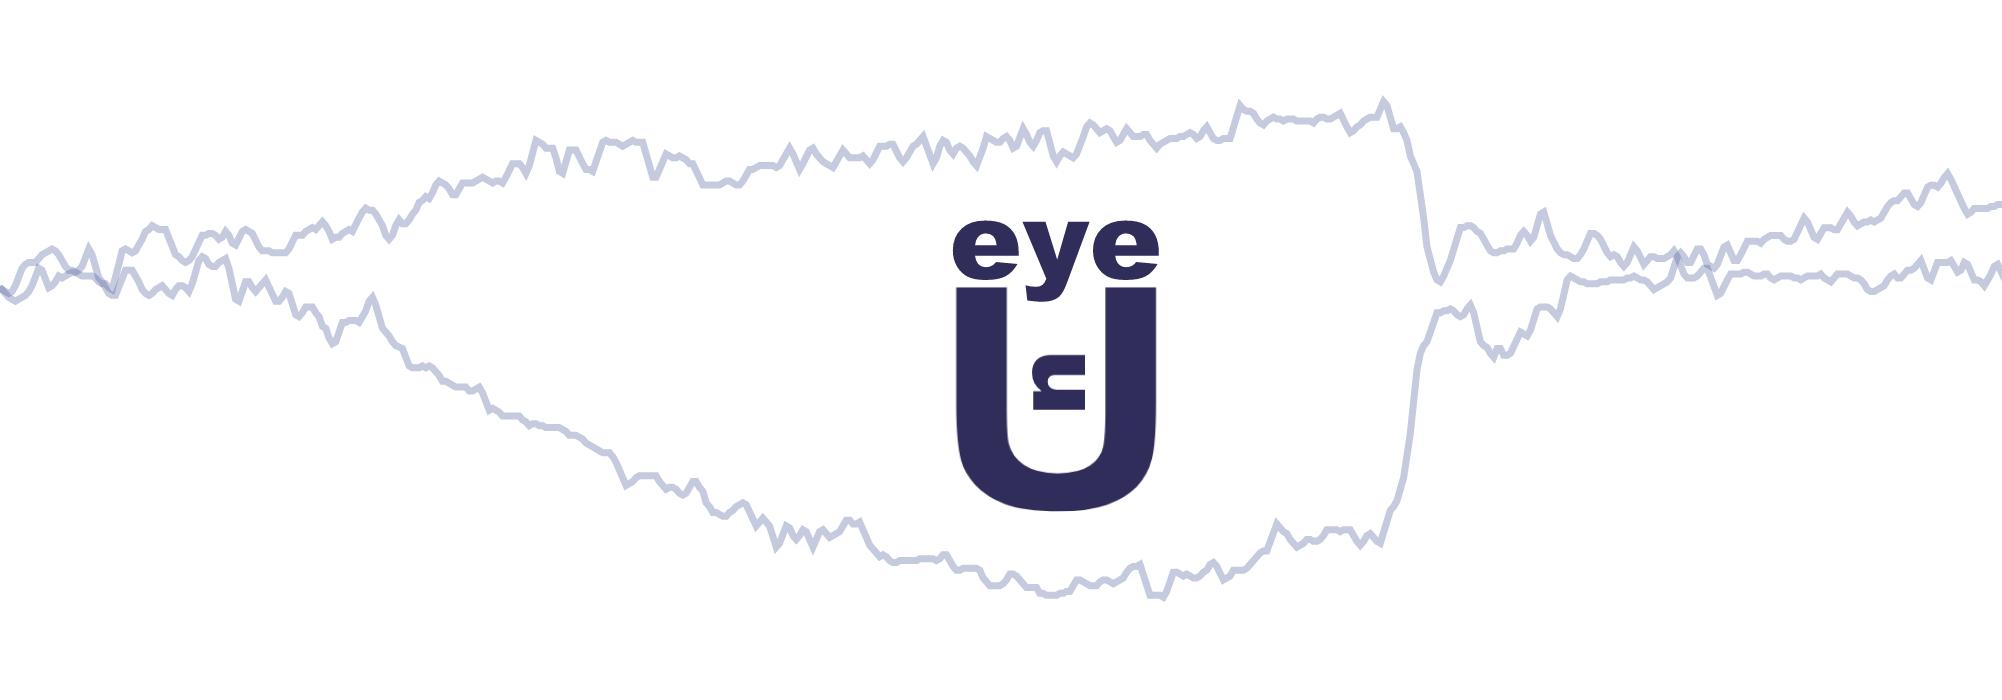 GitHub - berenslab/uneye: Deep neural network for eye